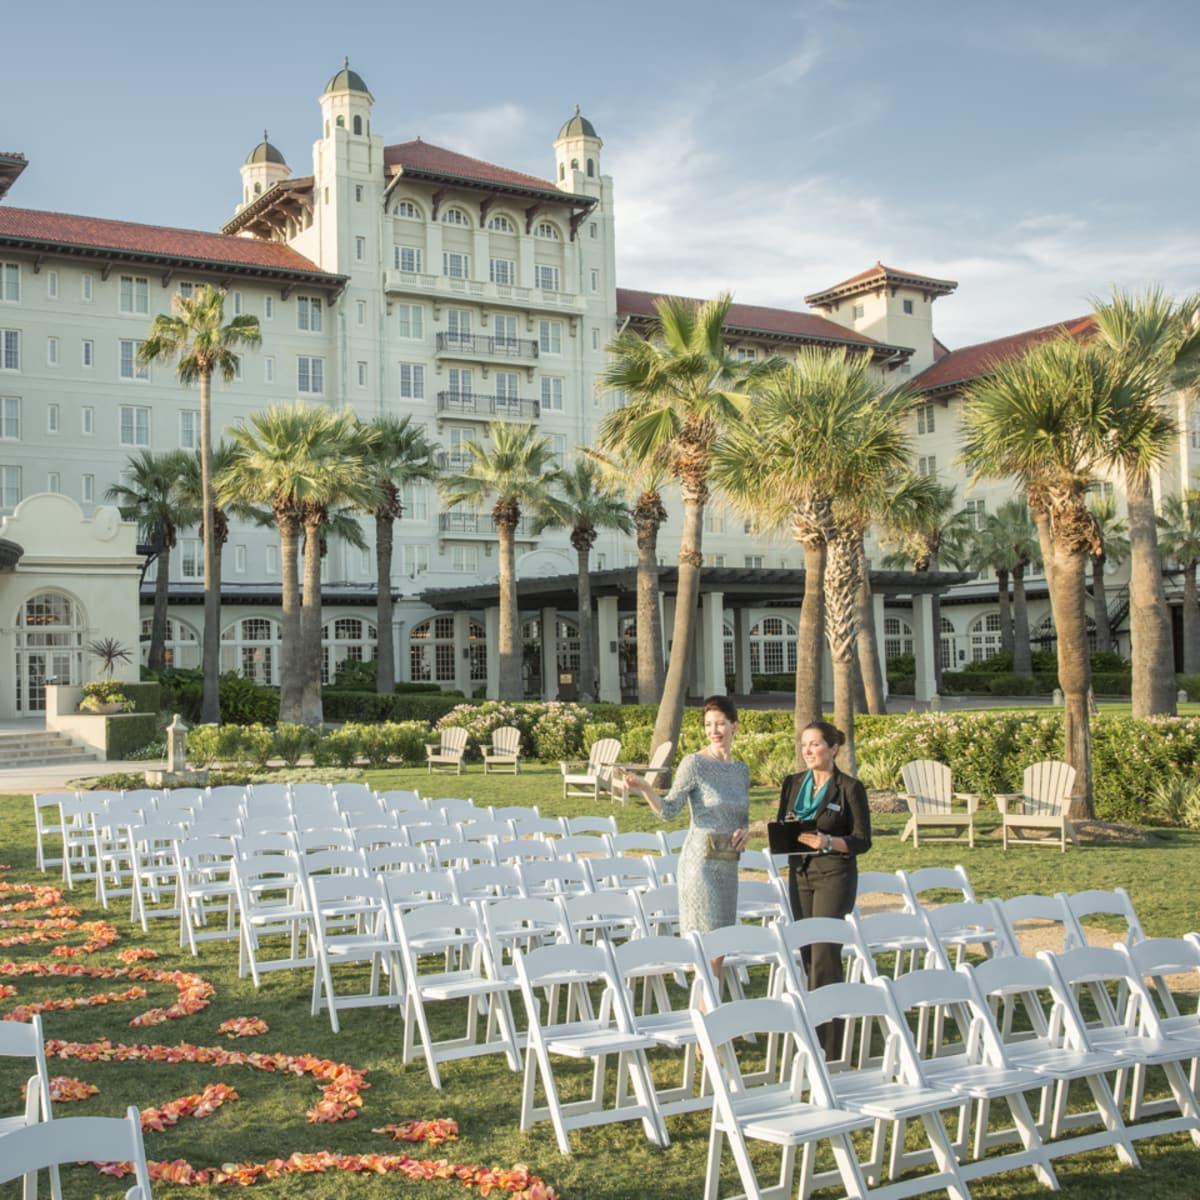 Hotel Galvez Centennial Green wedding